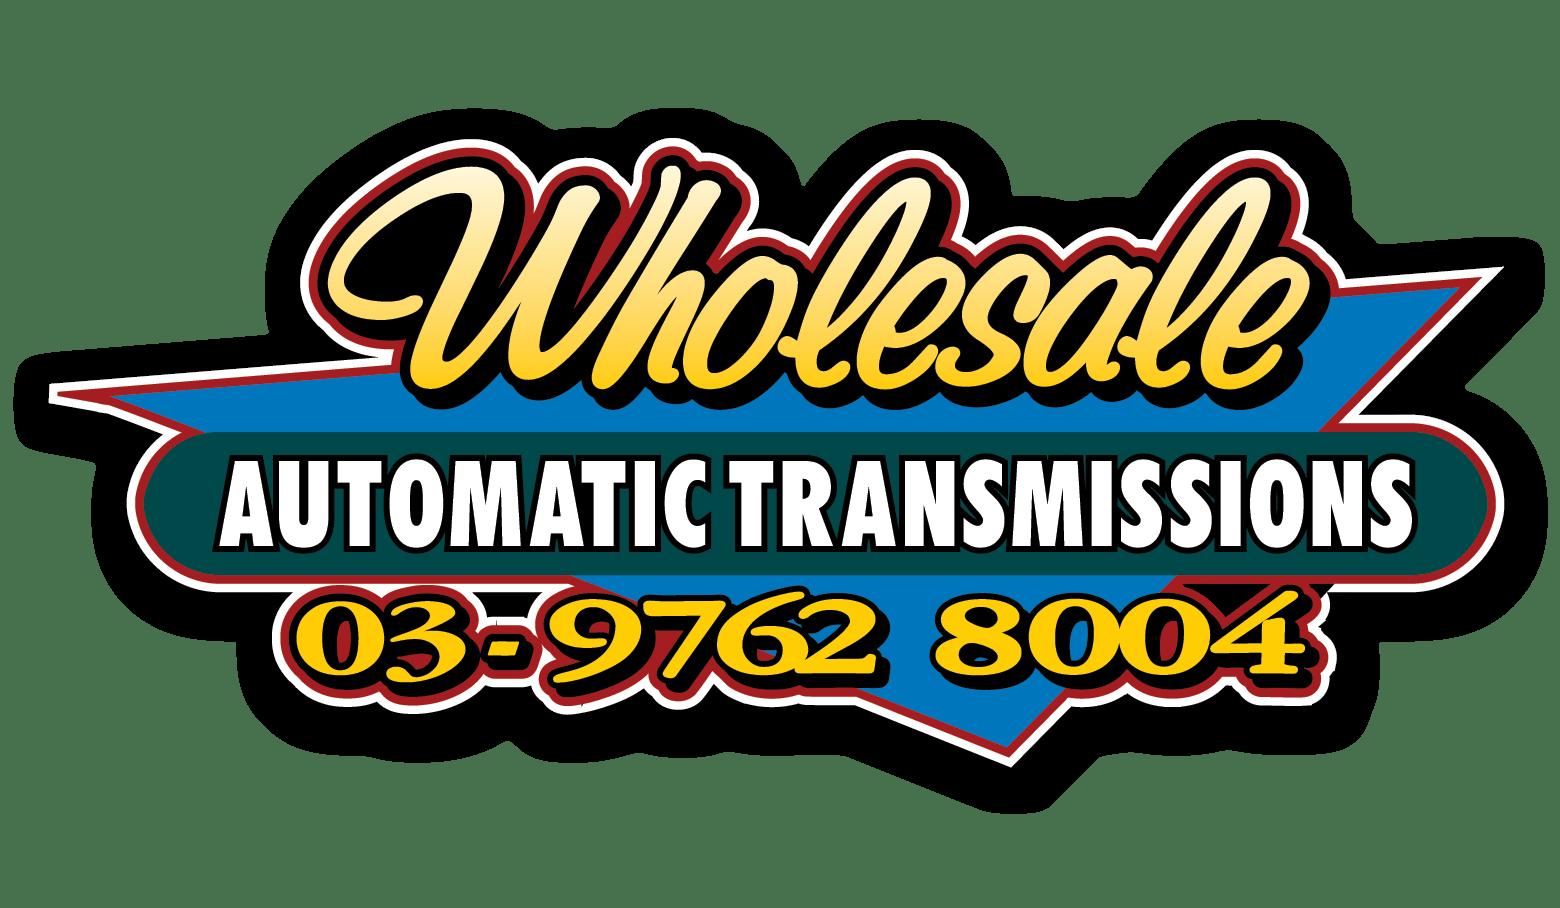 Wholesale Automatic Transmissions